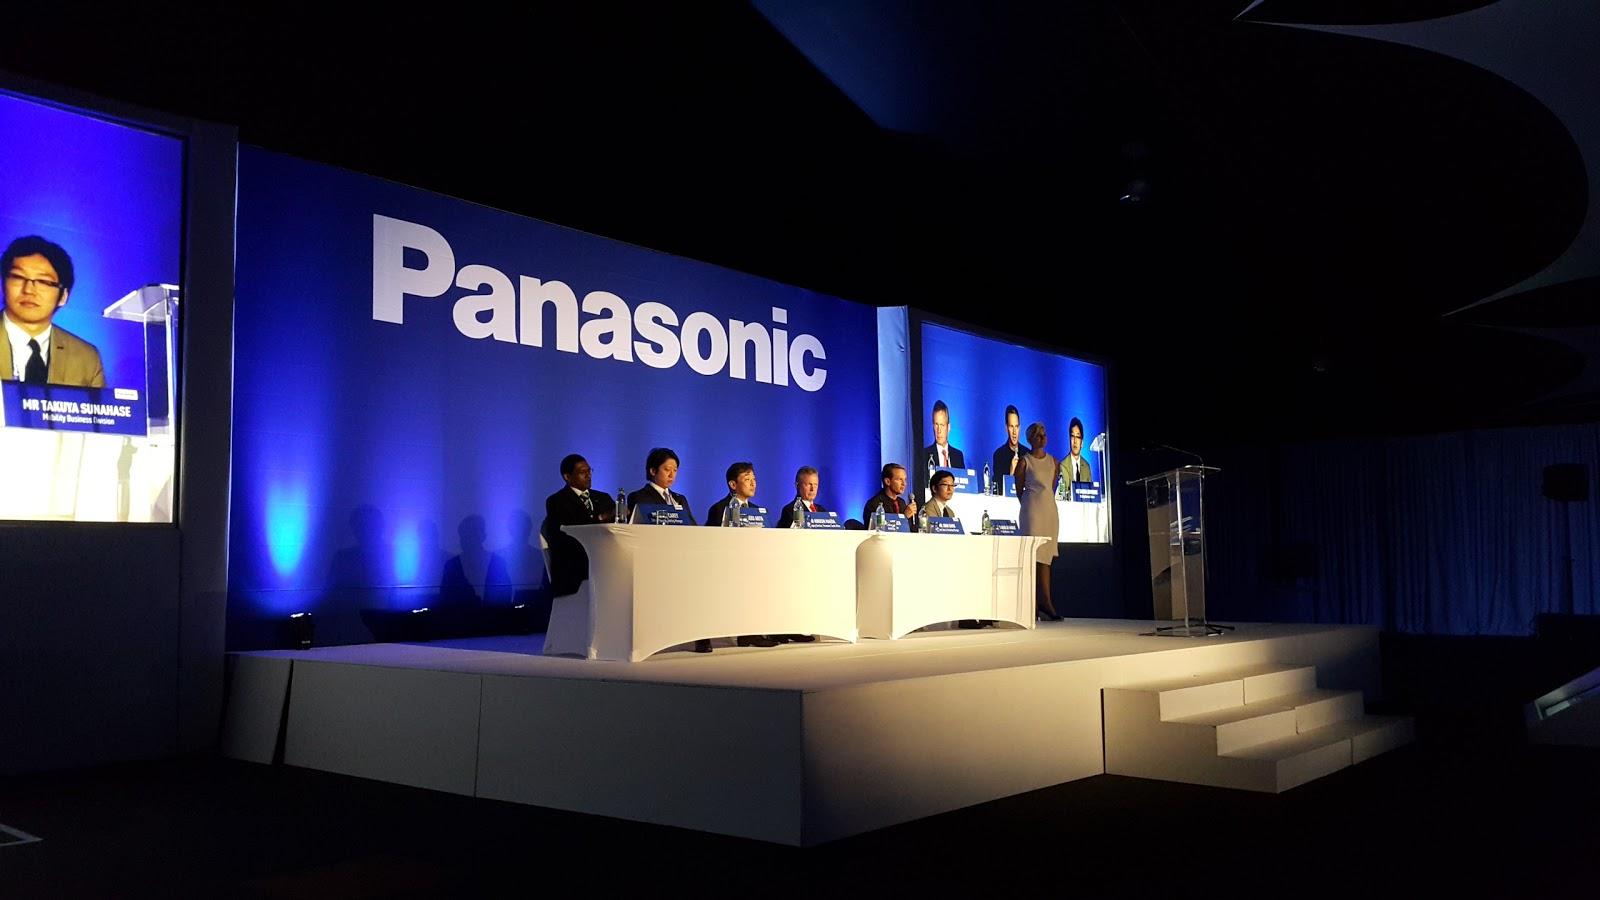 Panasonic Q and A session 2016